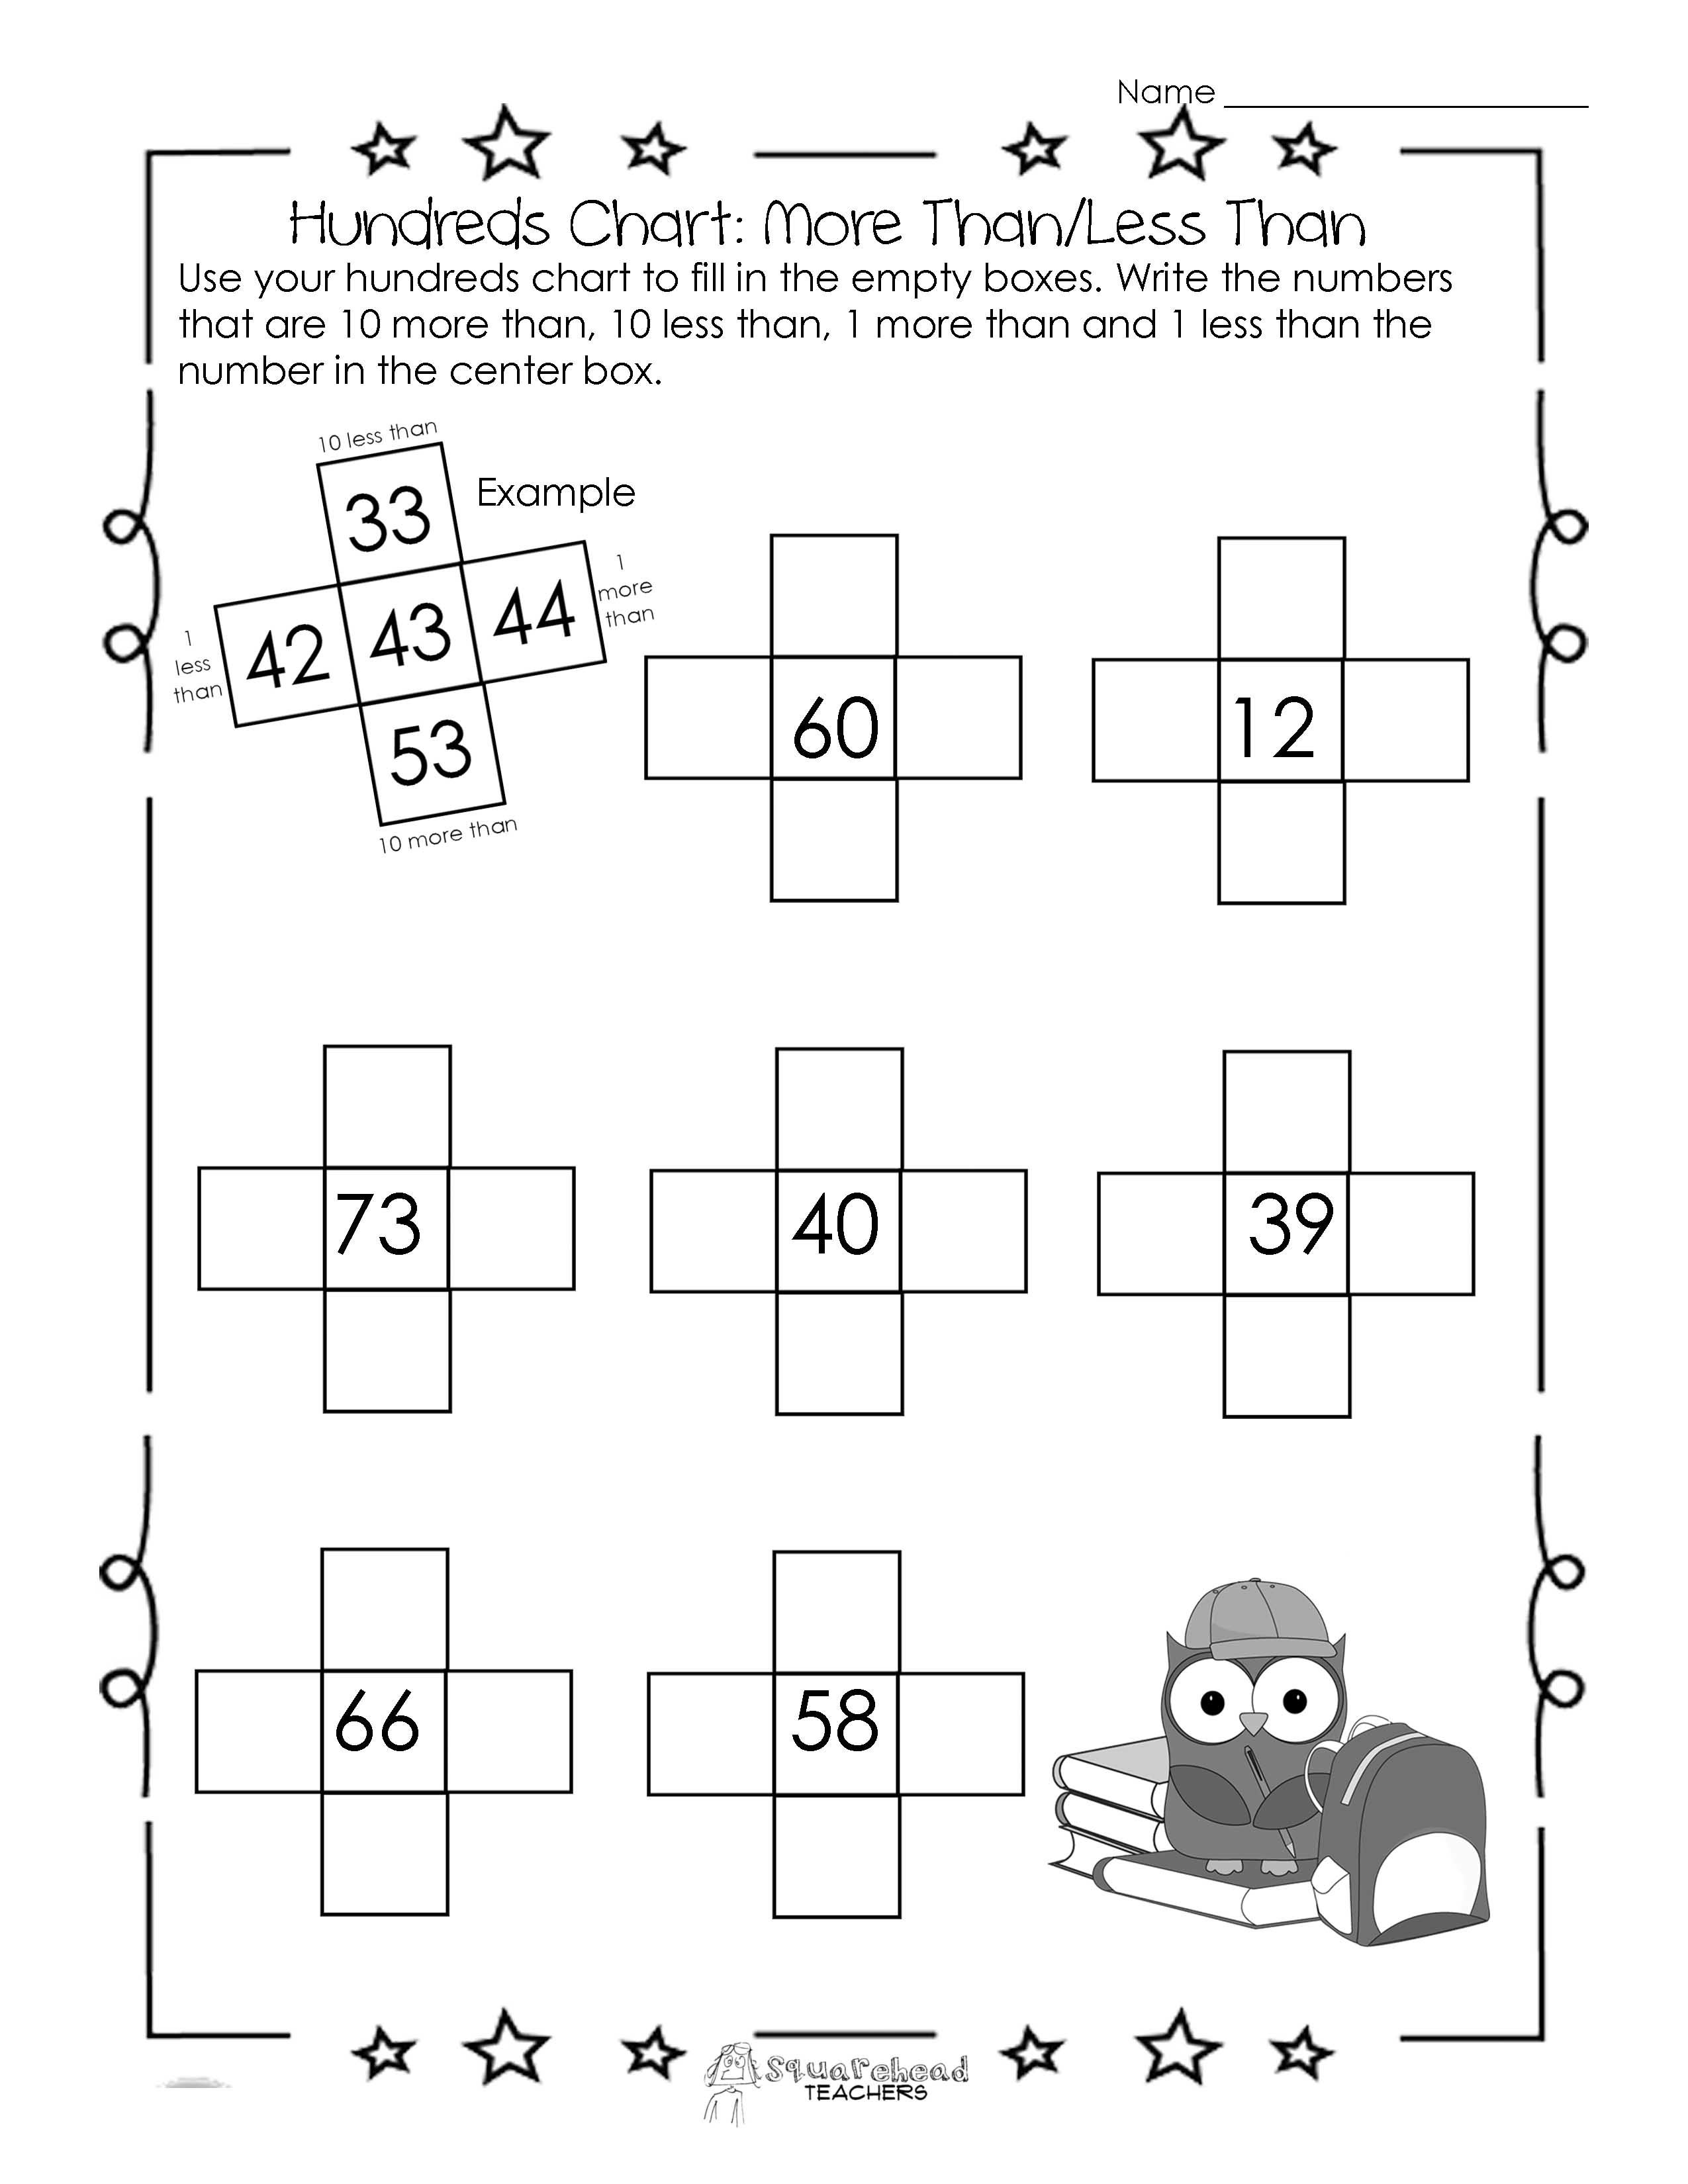 Squarehead Teachers Hundreds Chart Worksheet 10 More